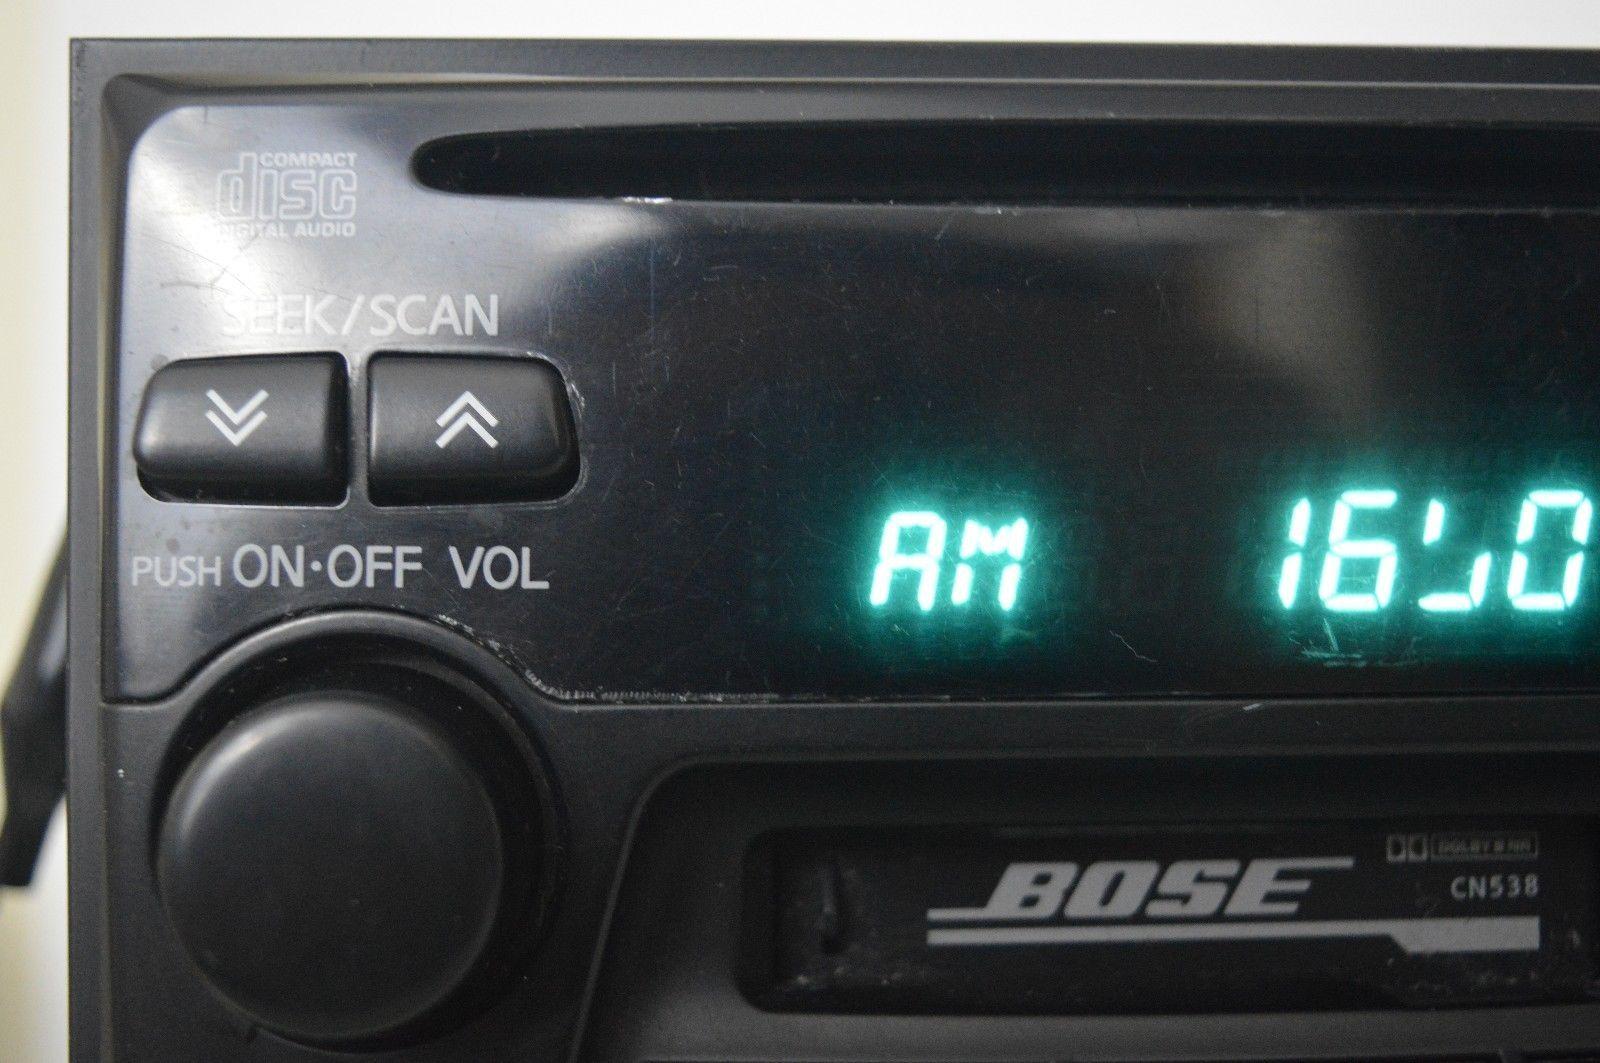 hight resolution of 95 96 97 98 99 nissan maxima radio bose cd player pn 2261f pathfinder cd